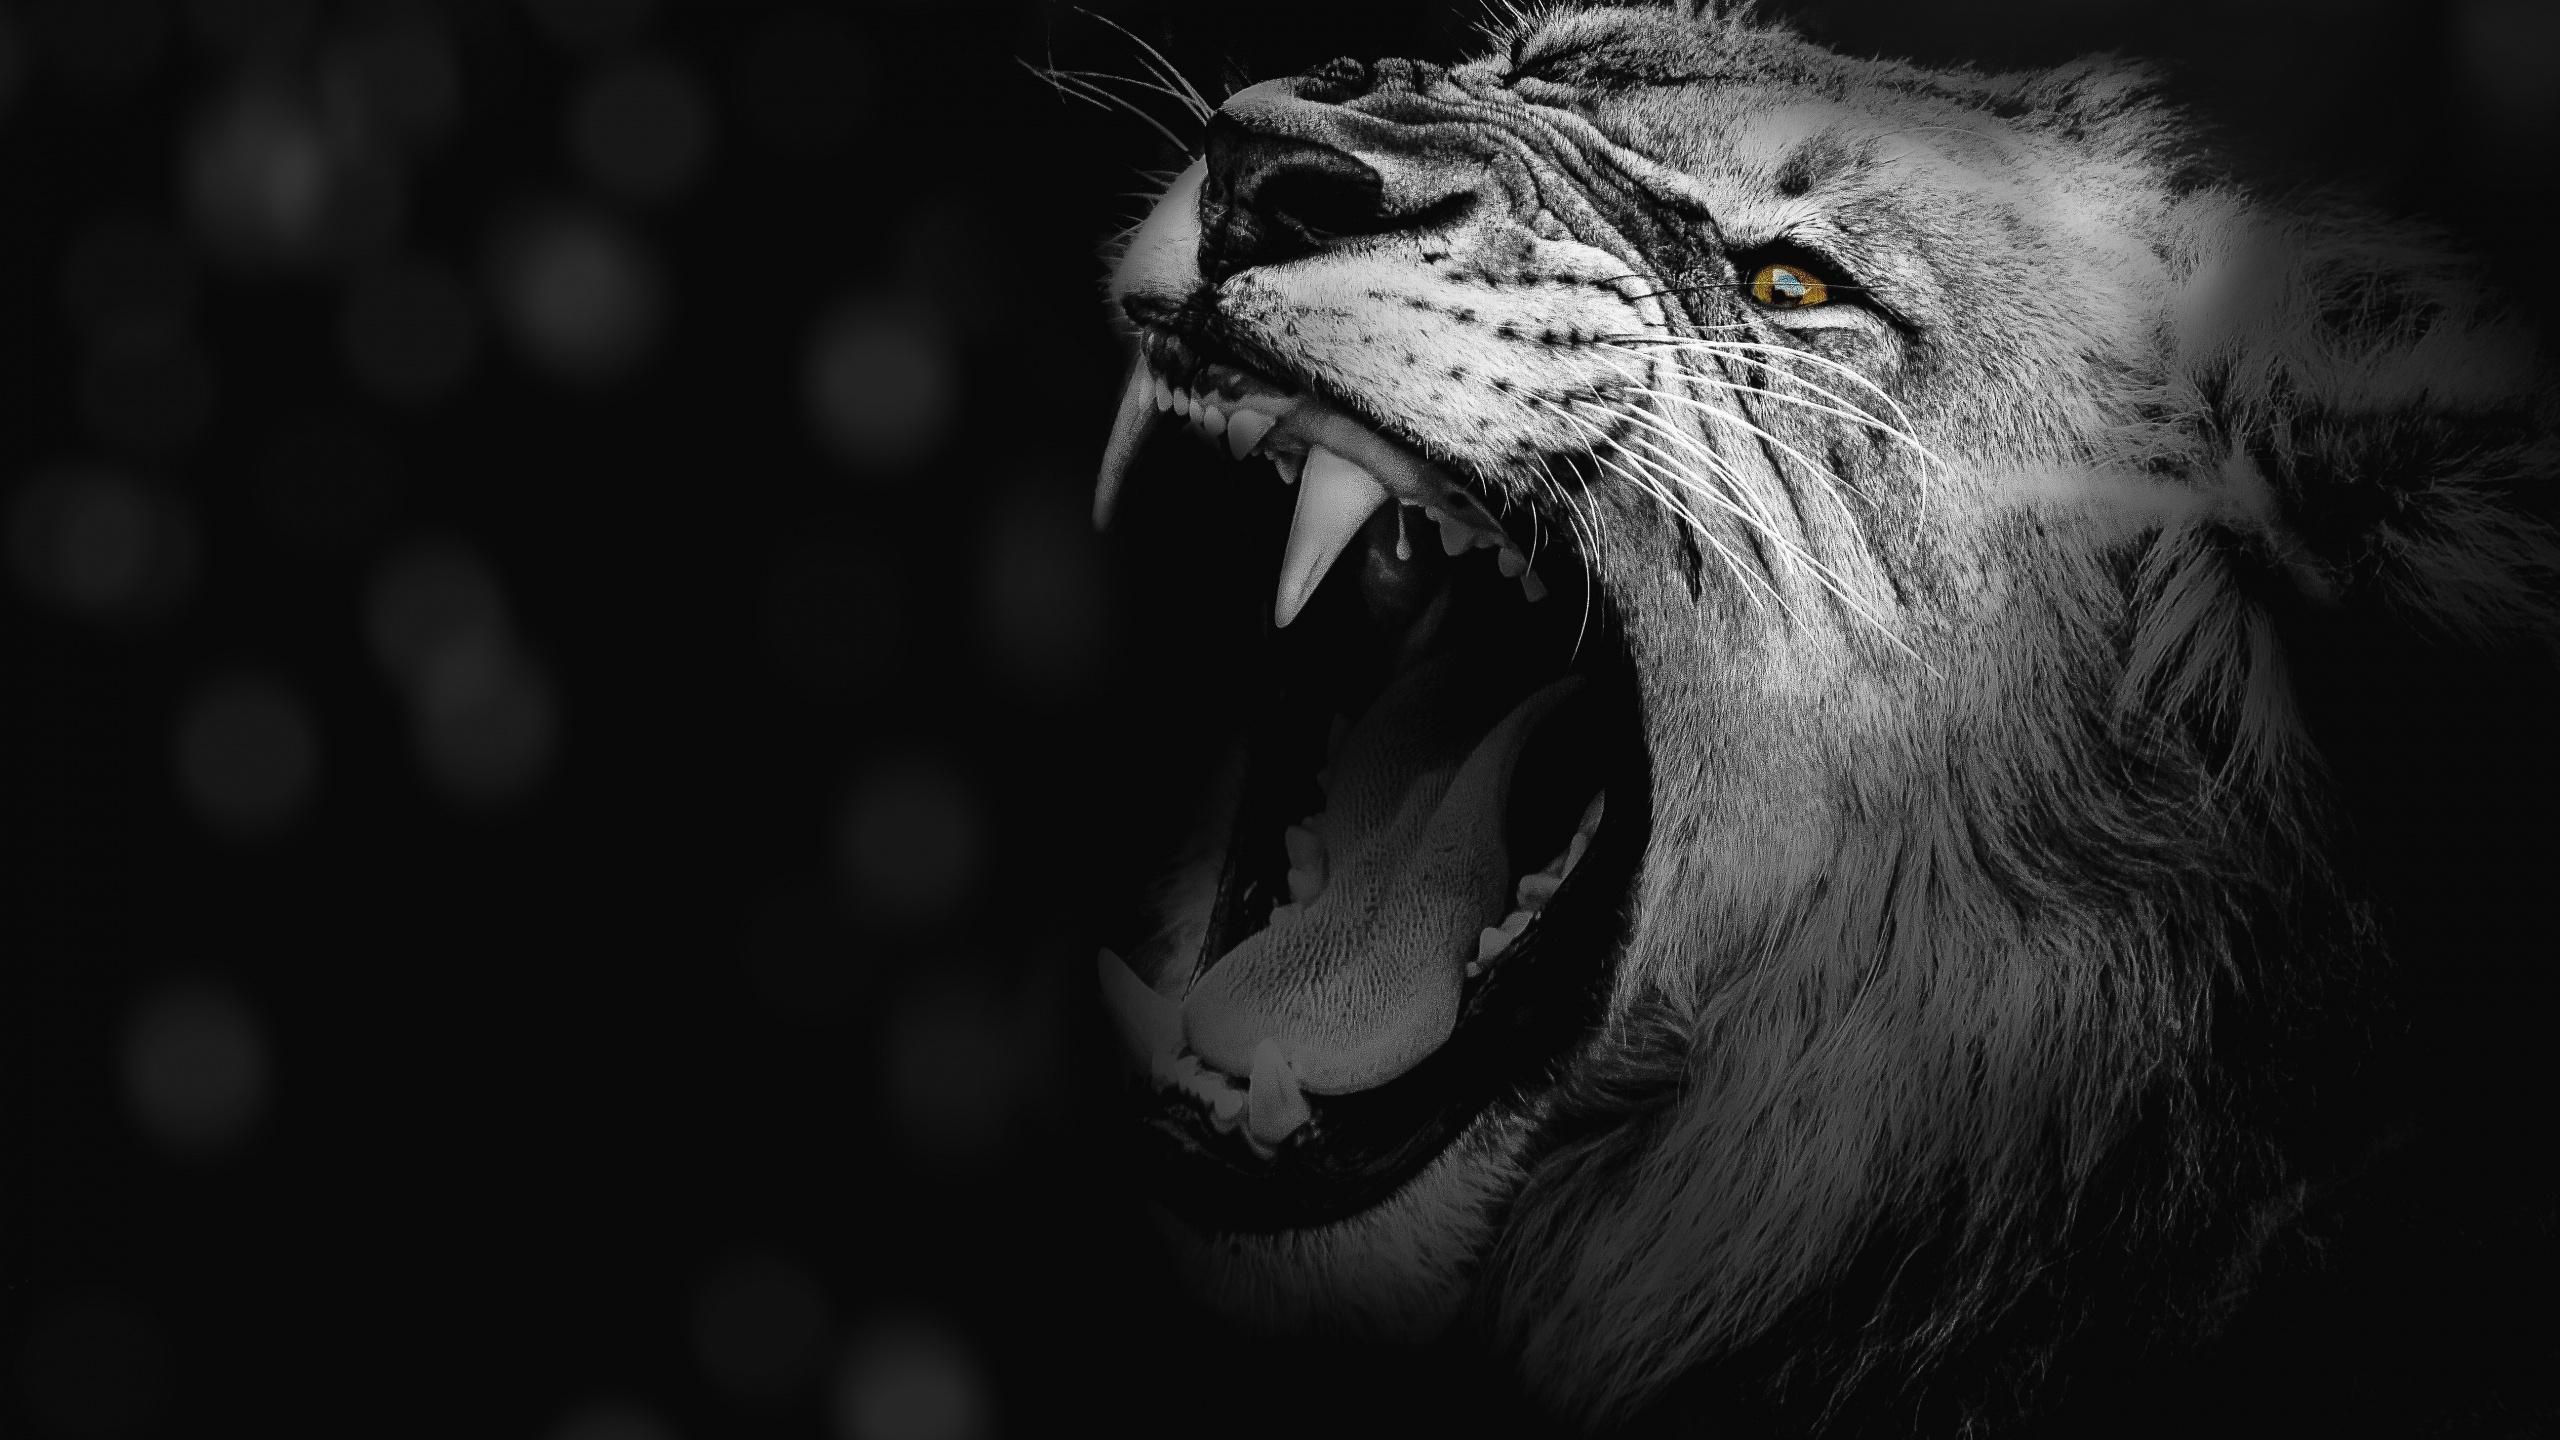 Lion 4k Wallpaper Roaring African Predator 5k Animals 1531